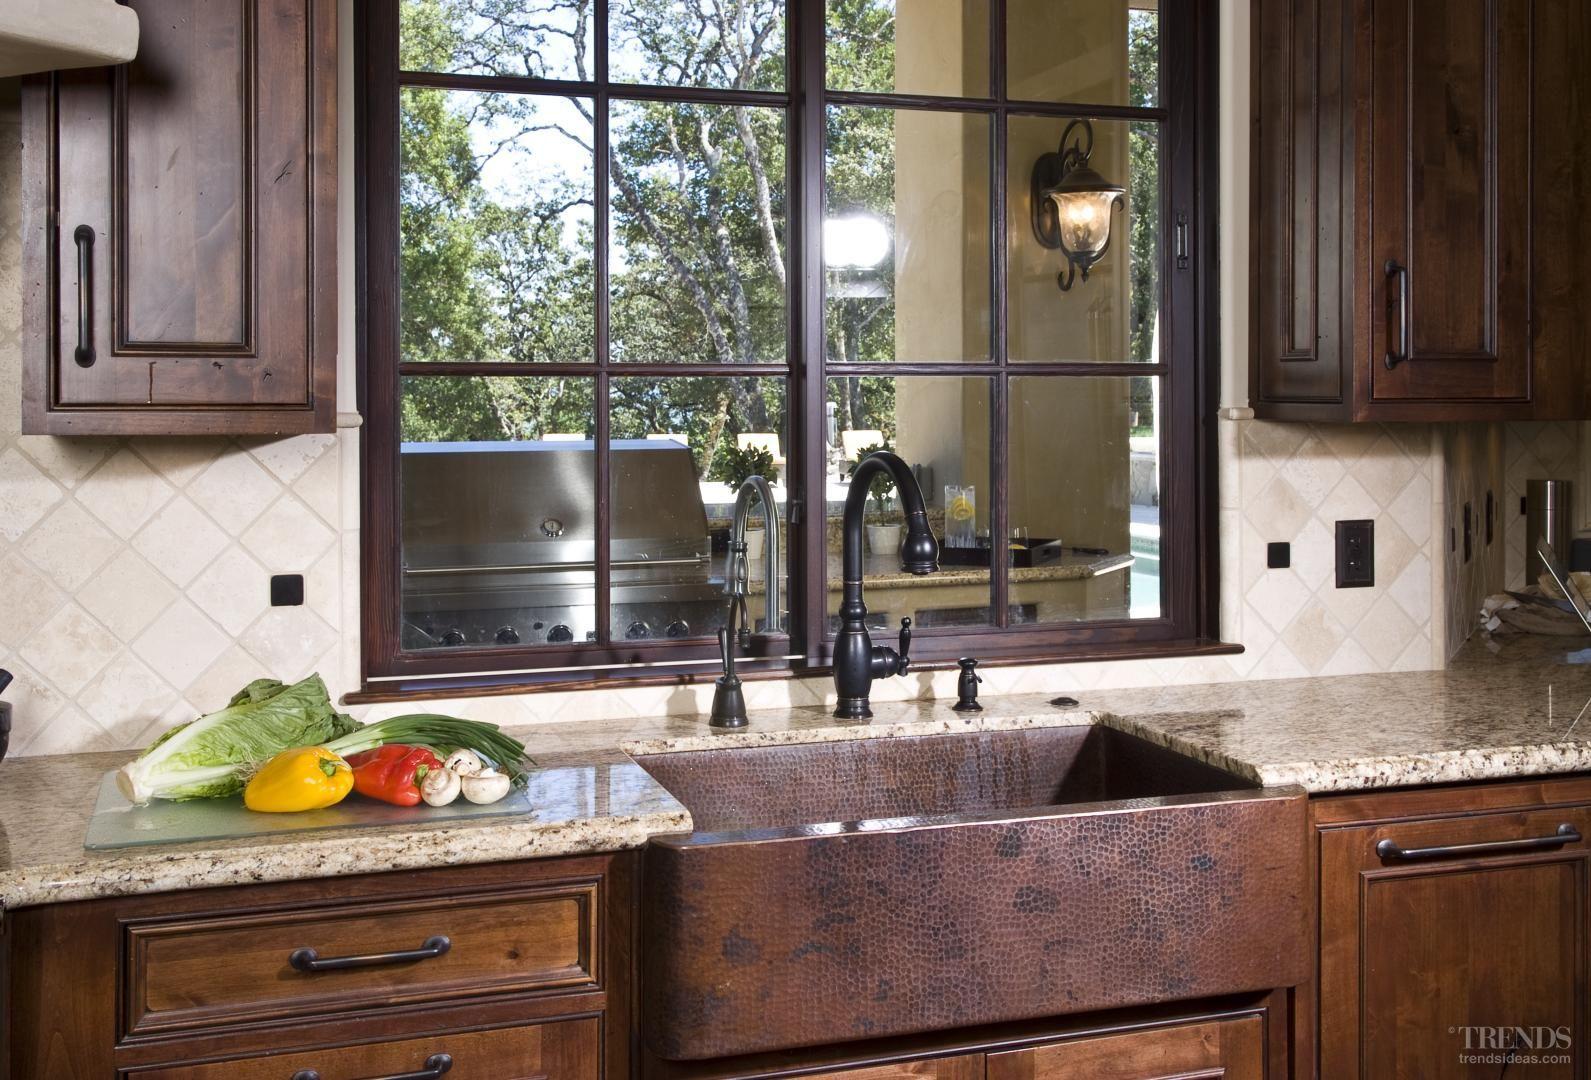 copper farmhouse sink stainless steel appliances - Google Search ...